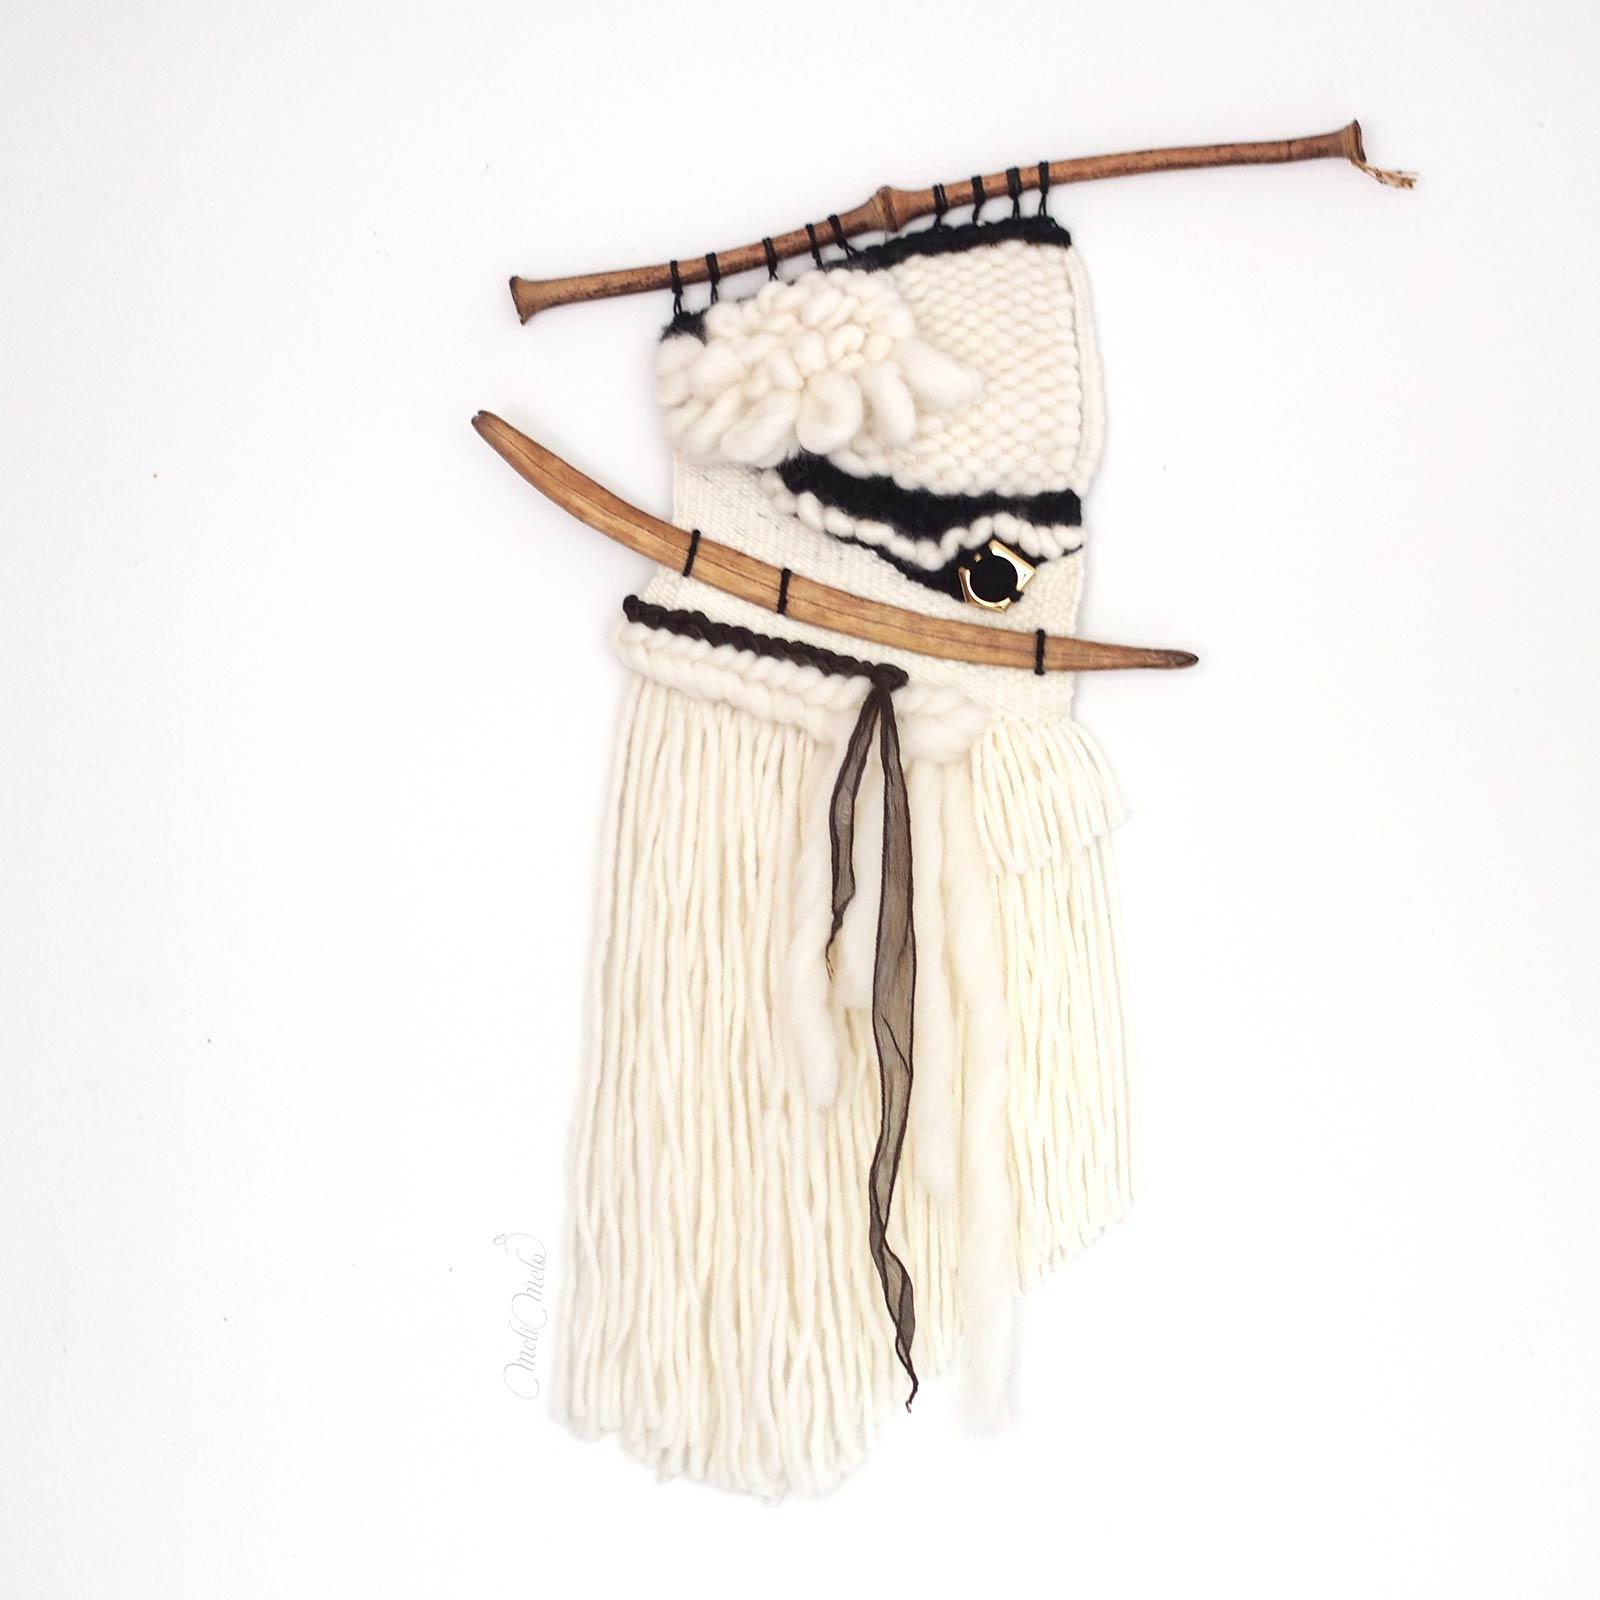 tissage laine lune d'or weareknitters wool laboutiquedemelimelo